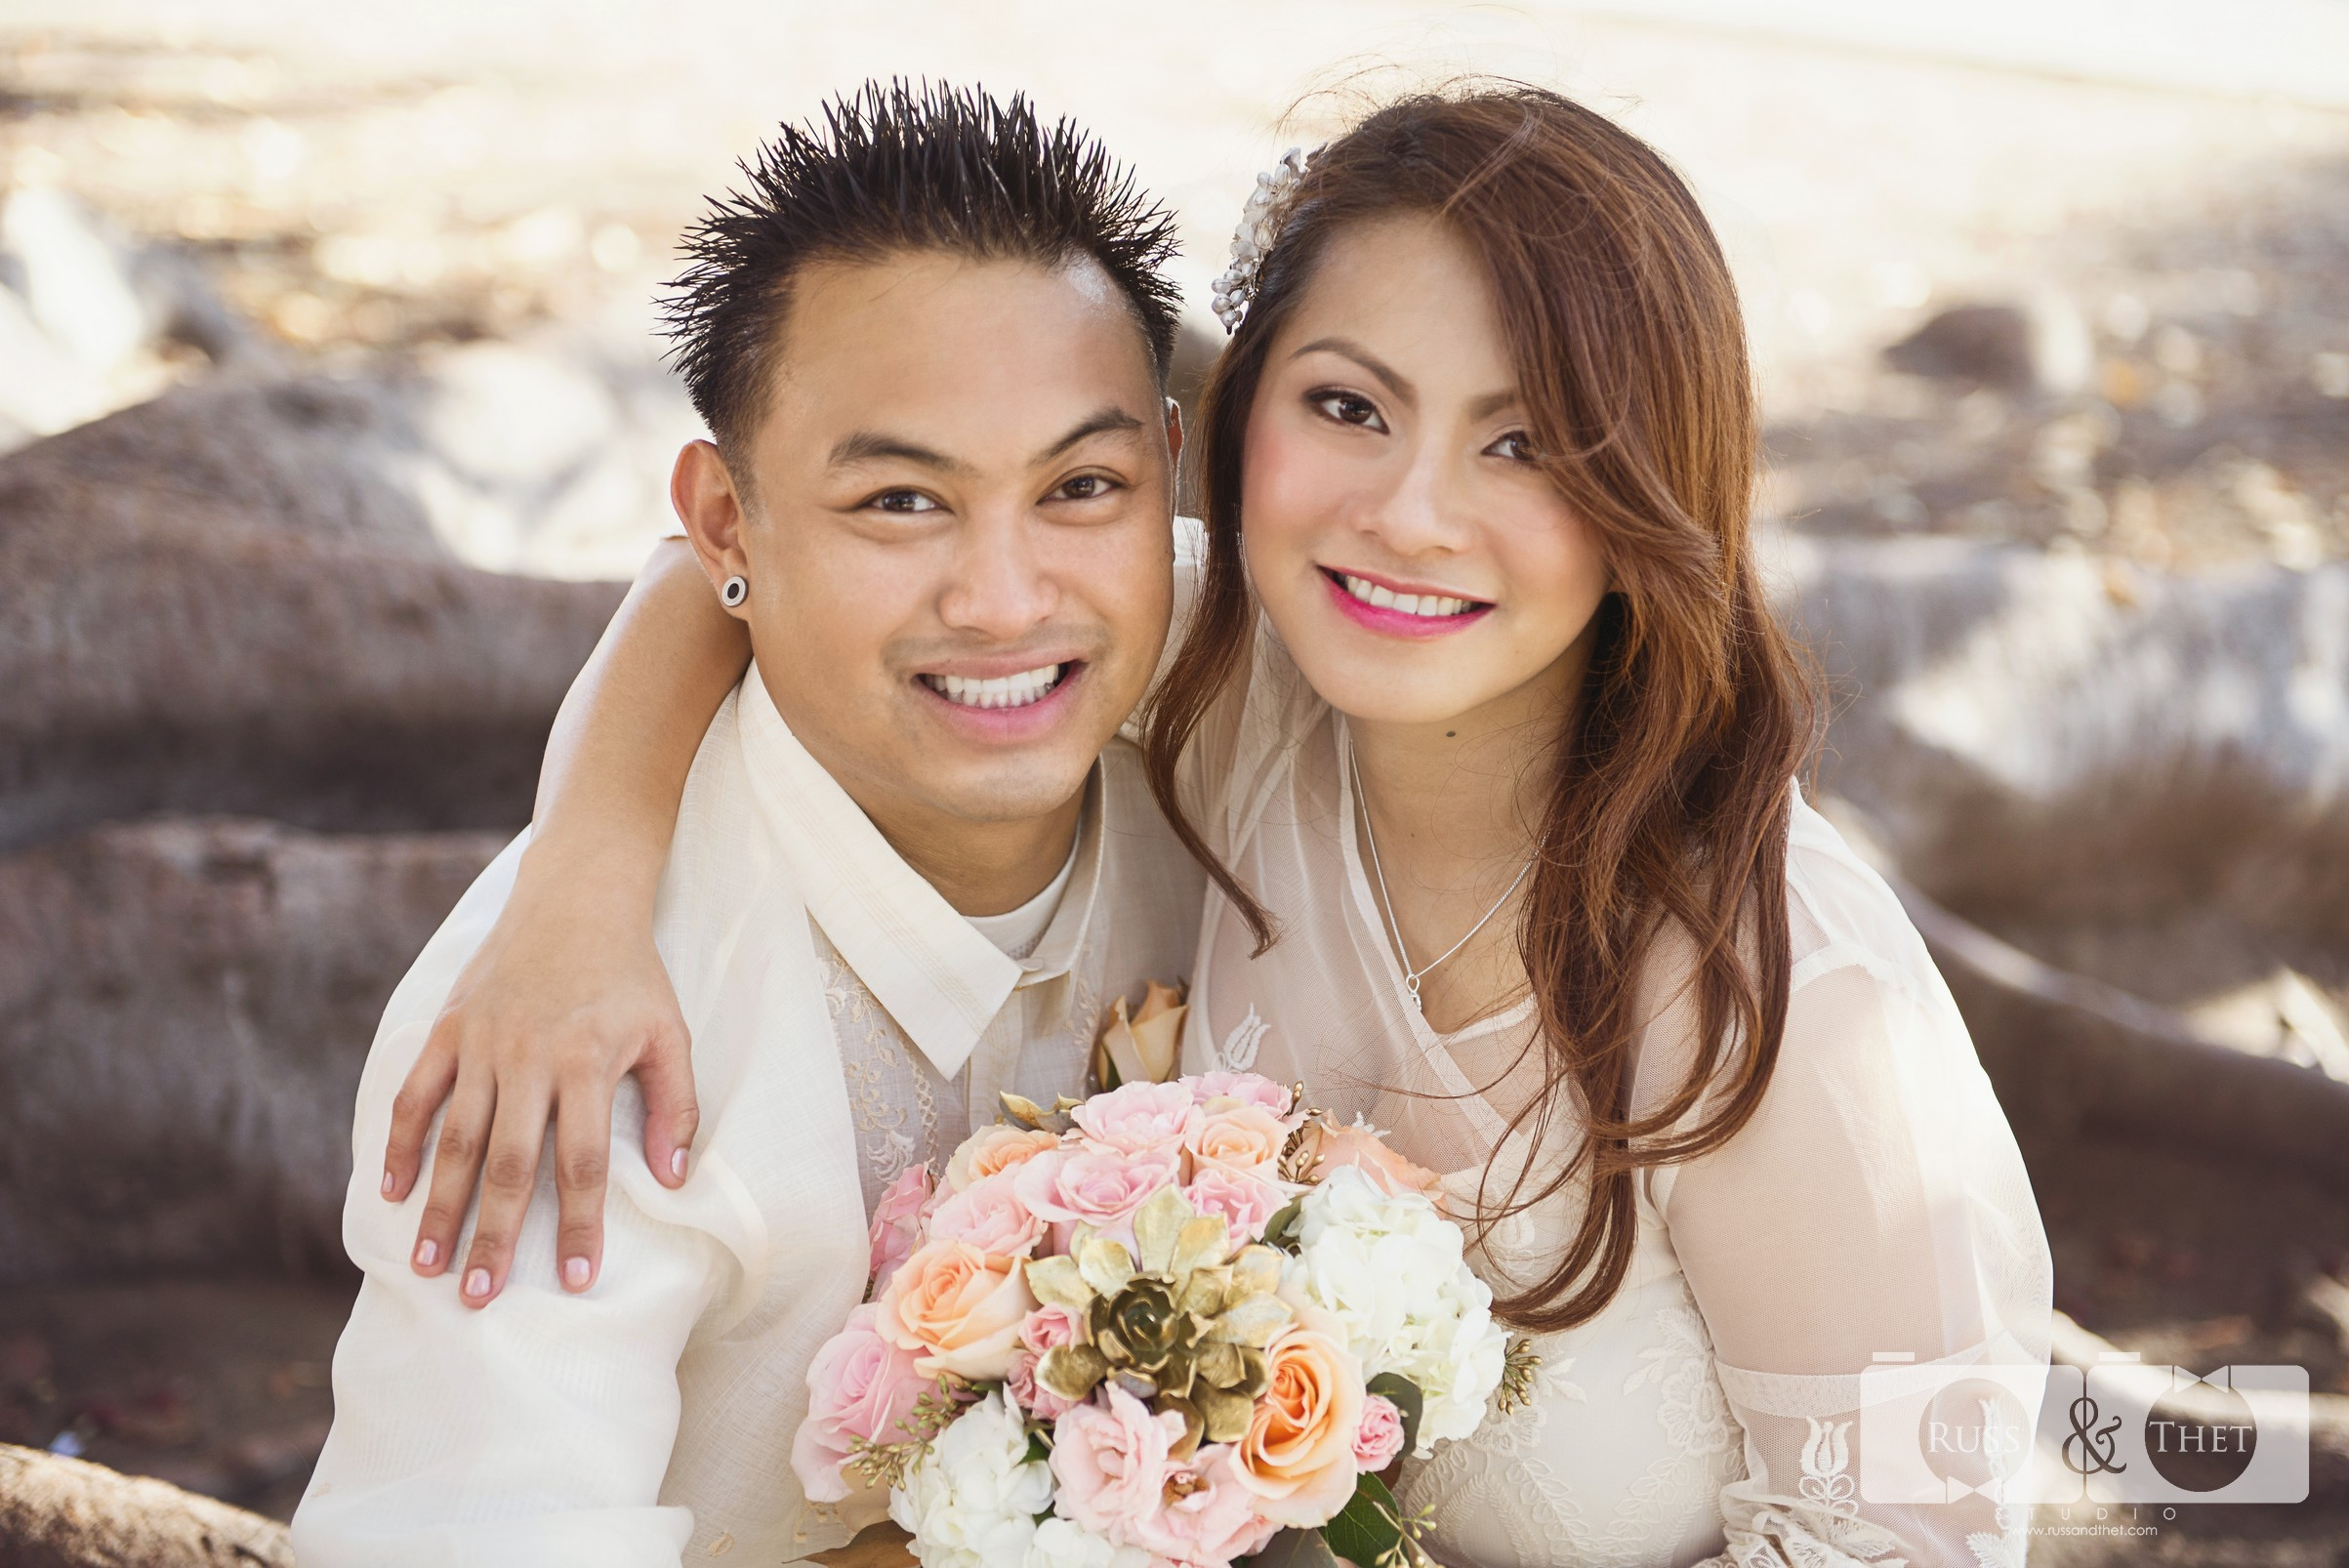 Anthony-Sarah-Los-Angeles-Wedding-Photographers (6).jpg